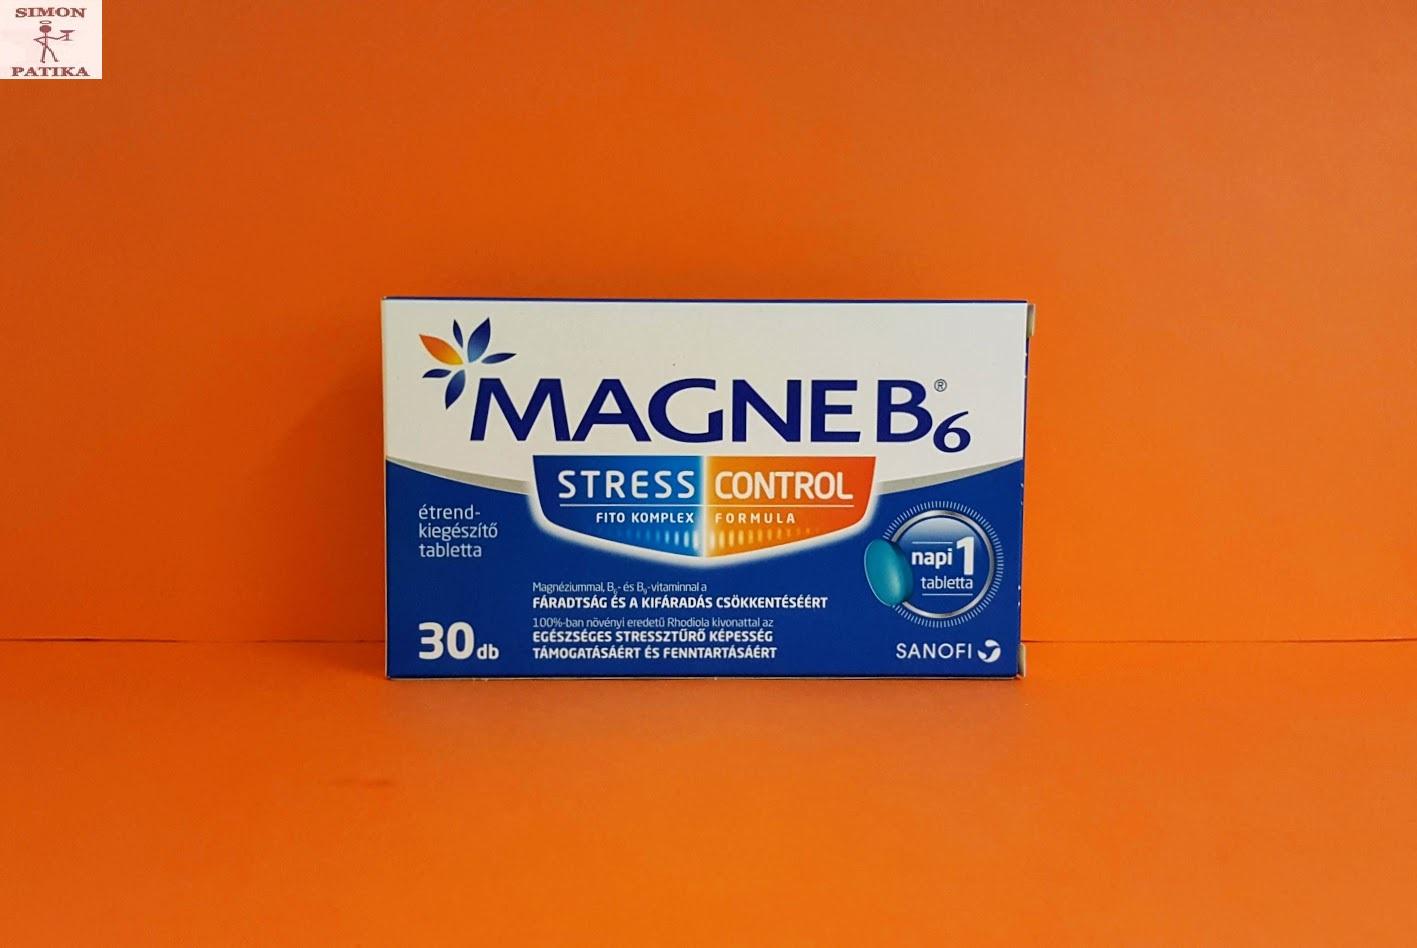 magne b6 magas vérnyomás